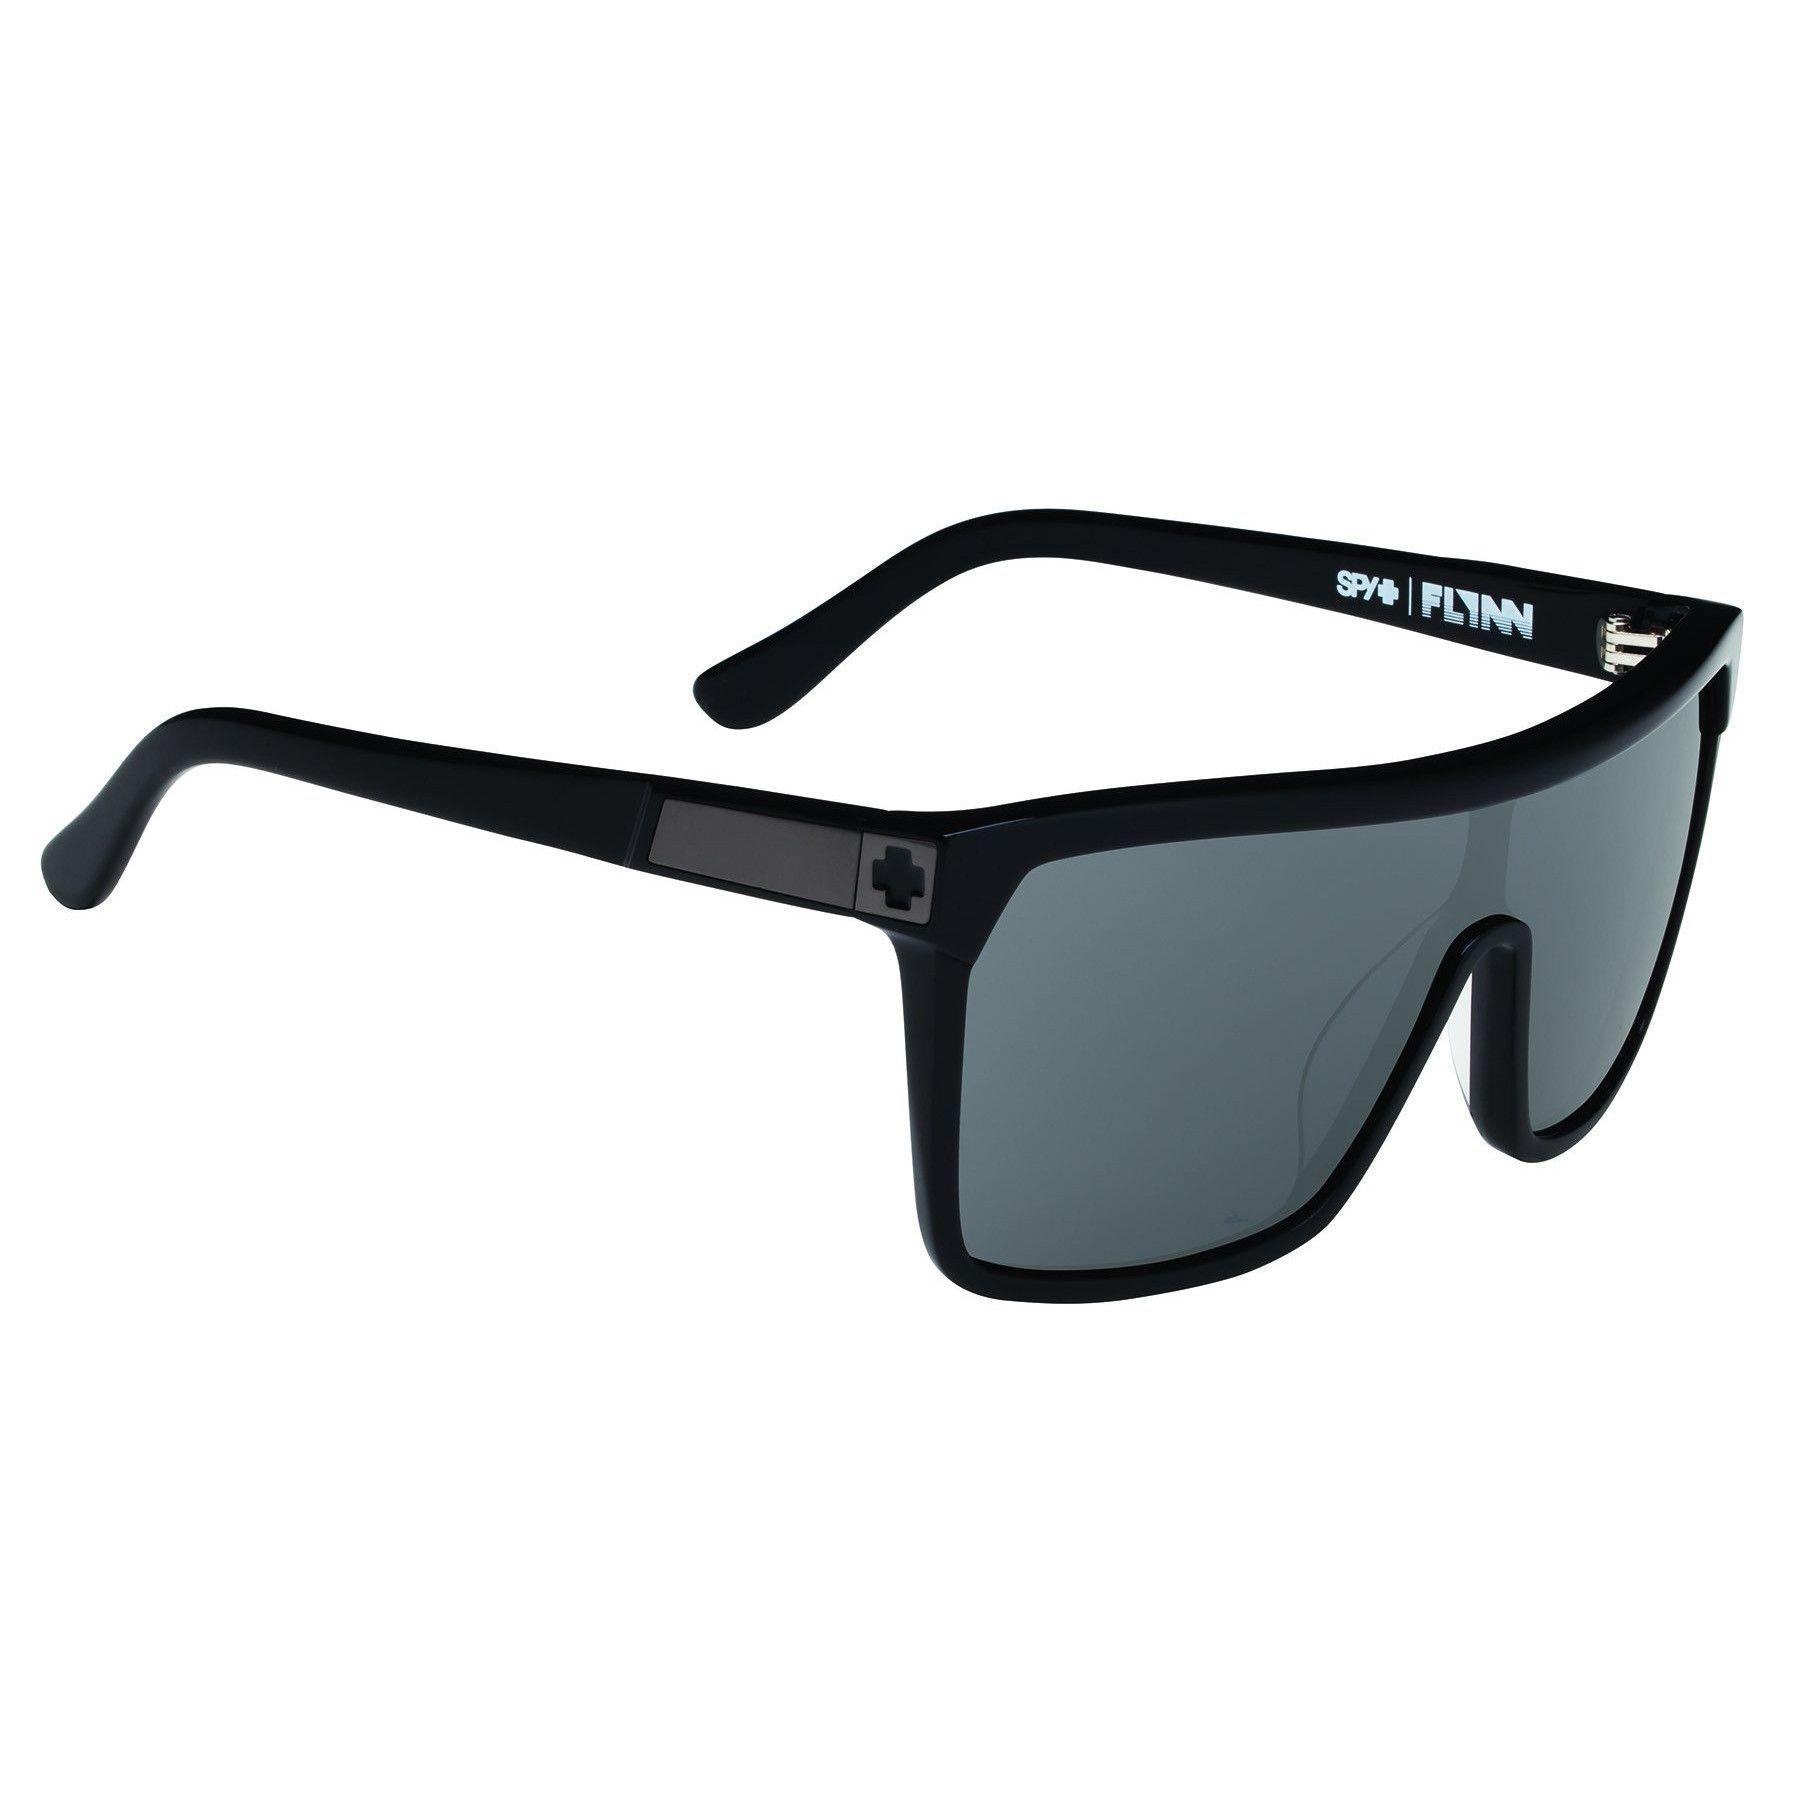 04c315066e56 Spy Optics Polarized Sunglasses « One More Soul